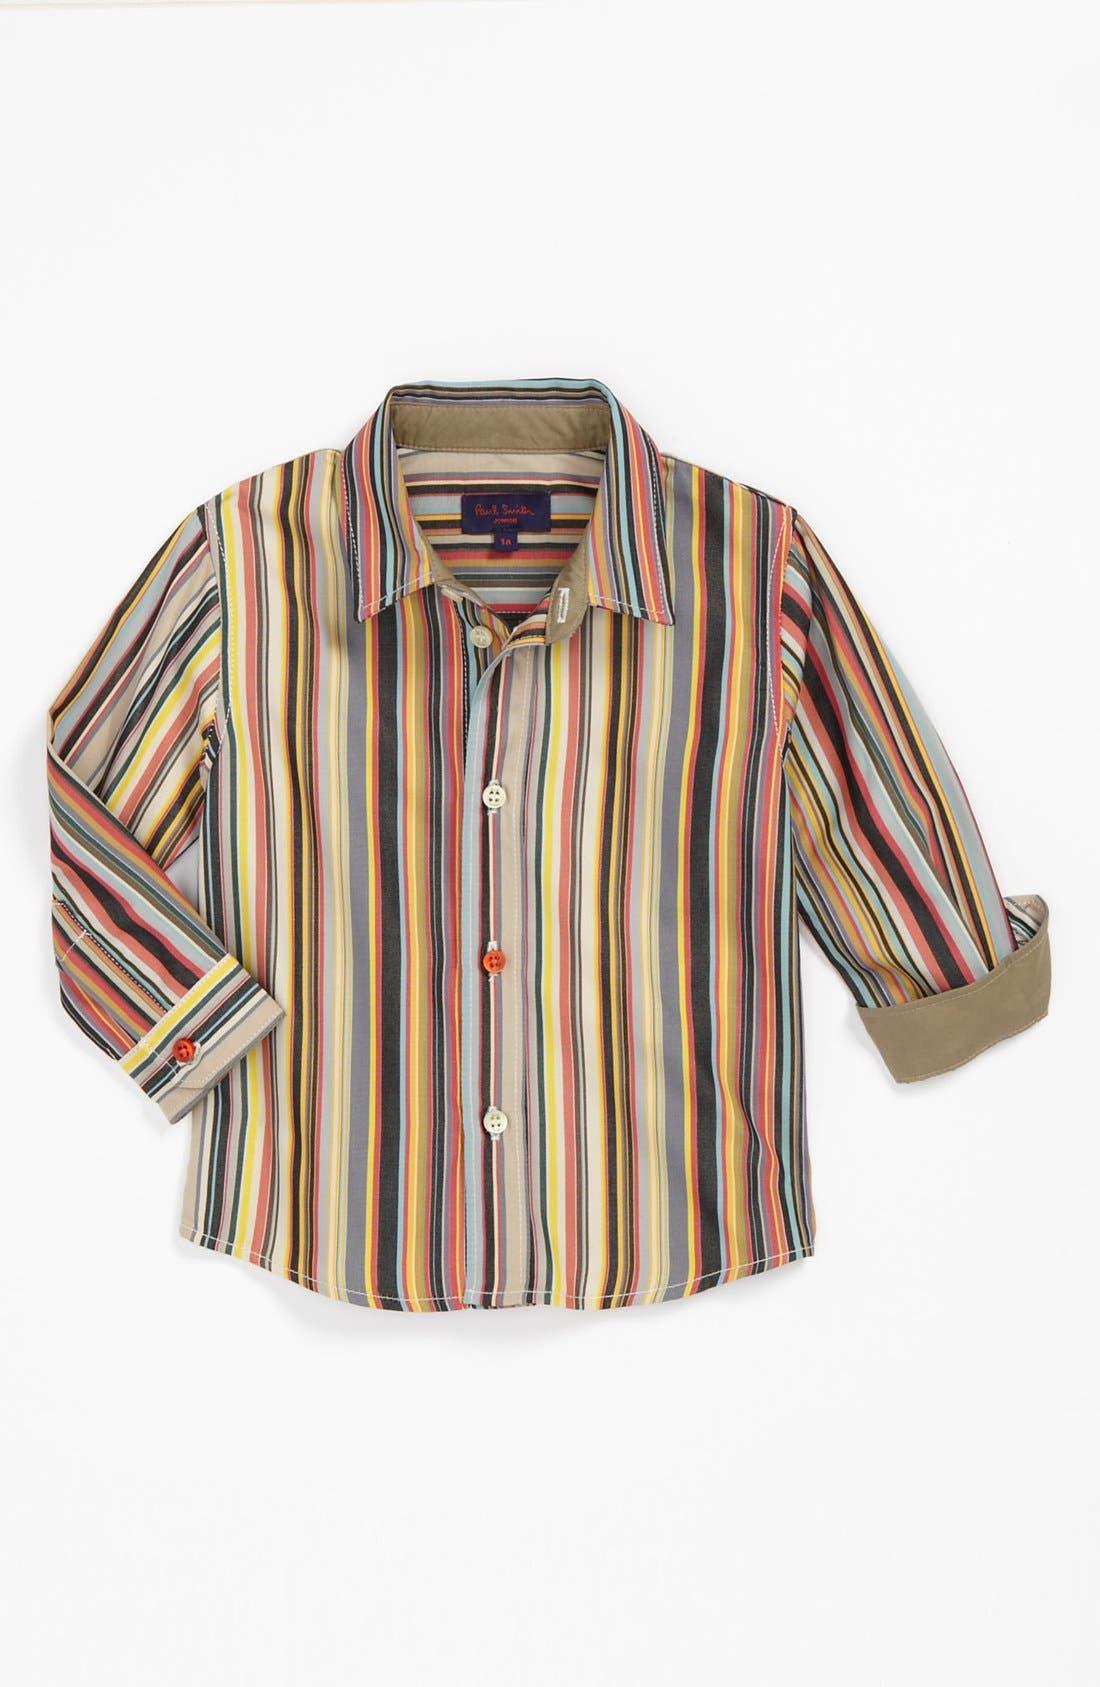 Alternate Image 1 Selected - Paul Smith Junior Woven Shirt (Toddler)